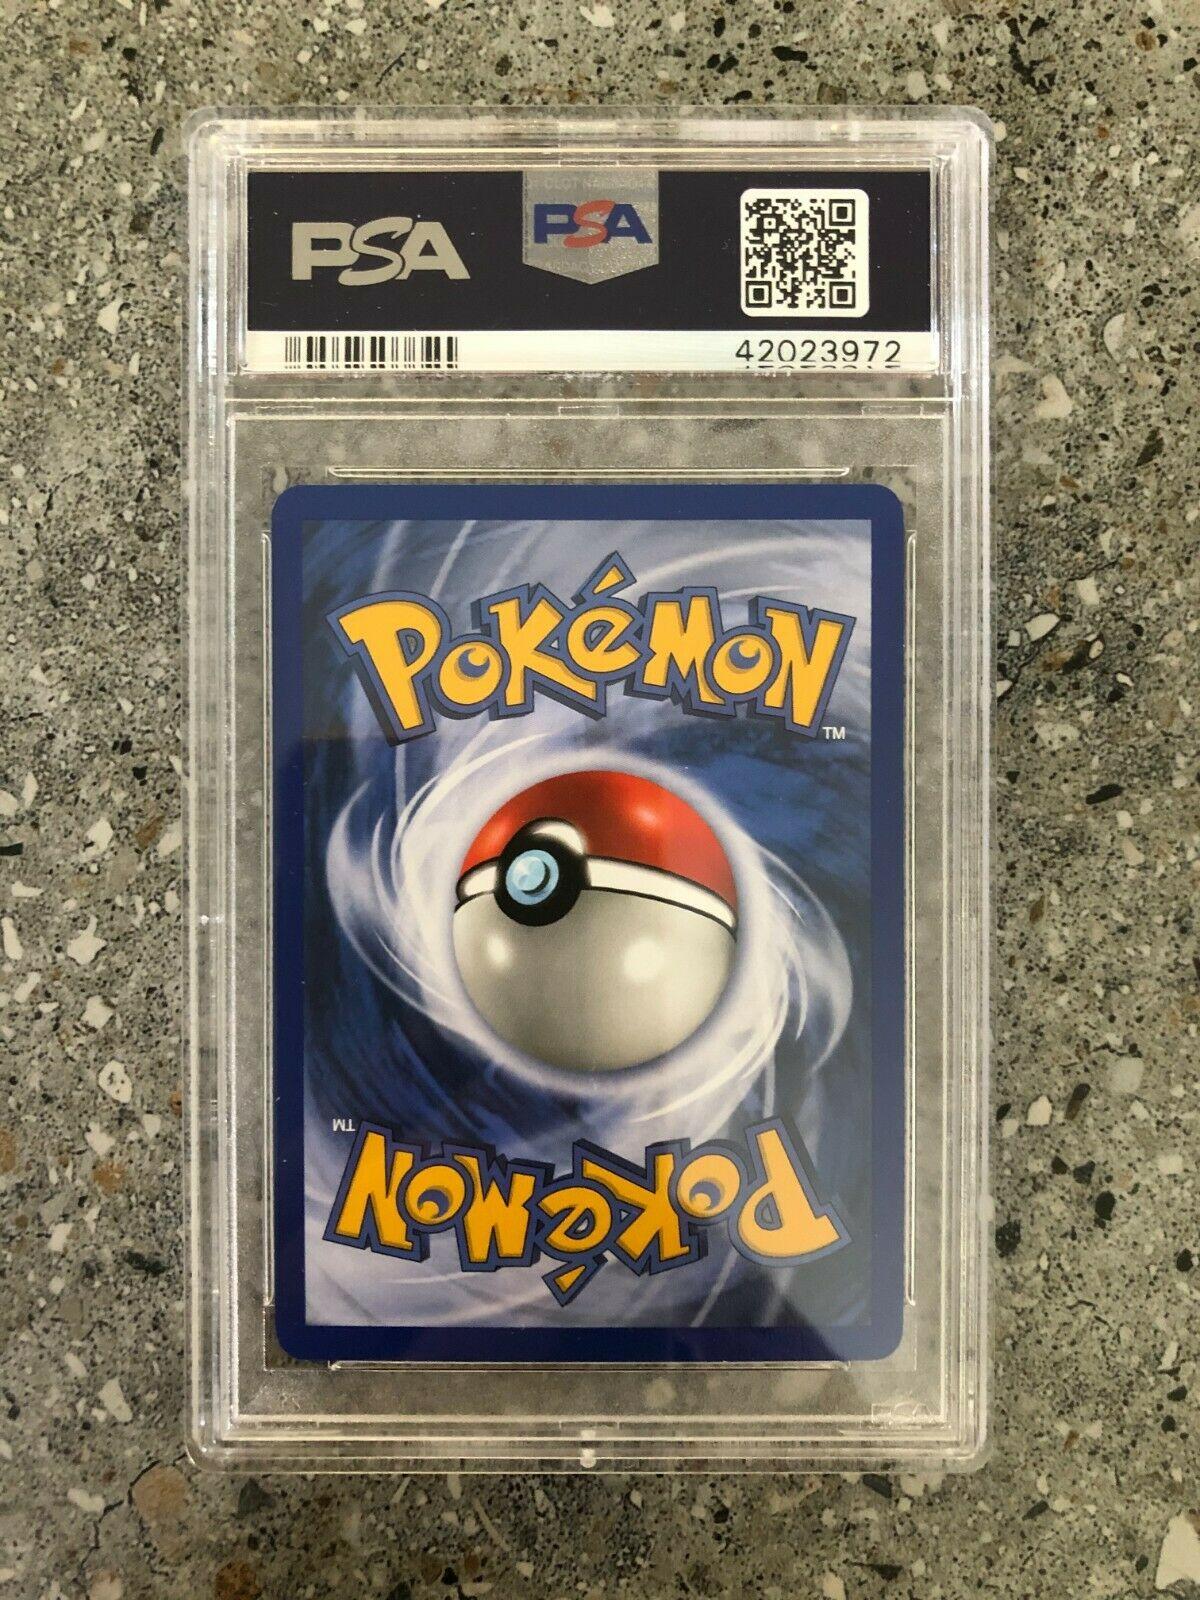 Pokemon TCG Cards 1st Edition Scizor 29/75 Neo Discovery Rare PSA 10 GEM MT - Image 3